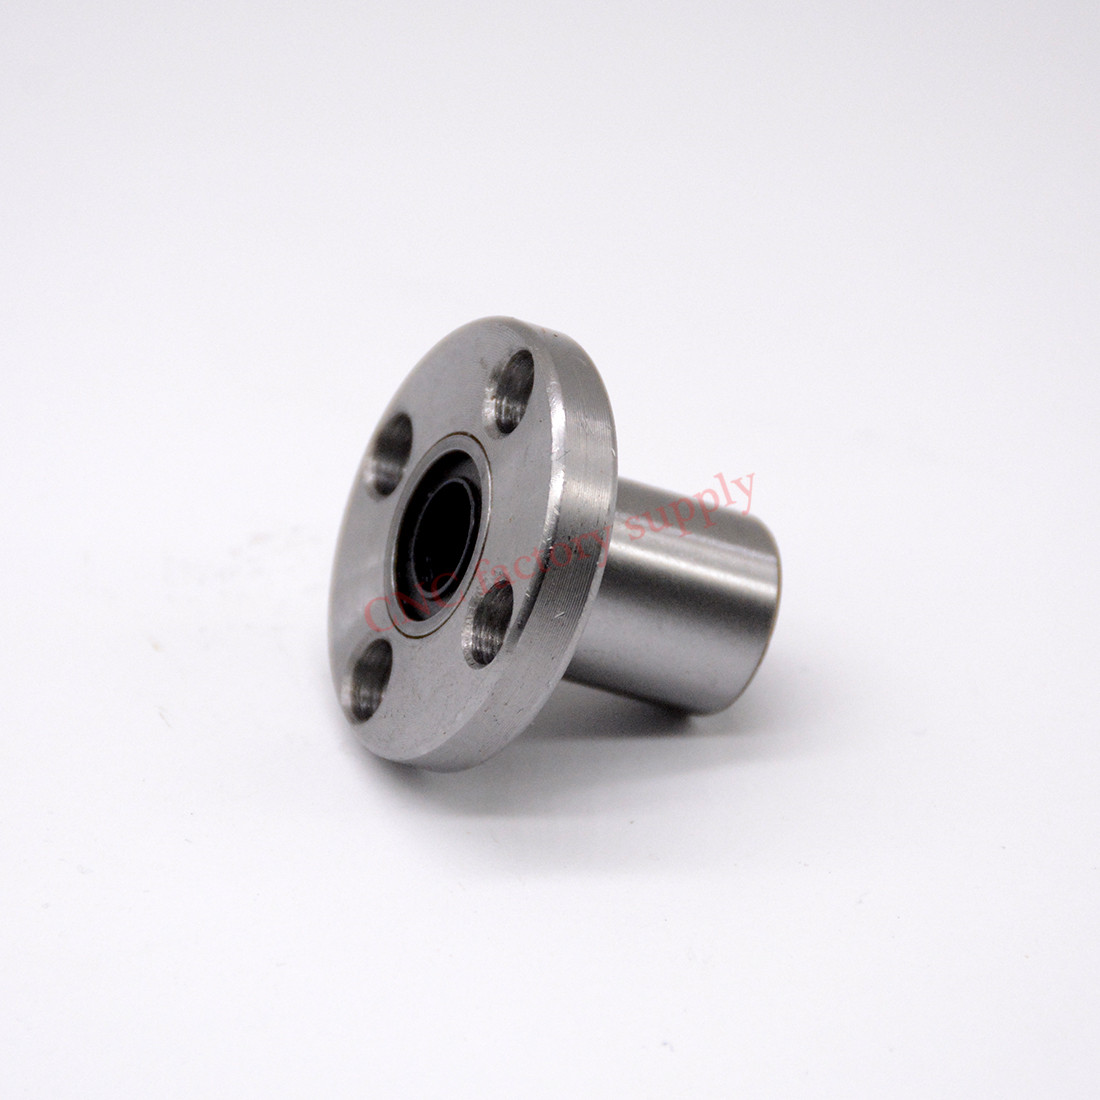 Hot sale  1pc LMF20UU 20mm flange linear ball bearing for 20mm linear shaft CNC hot sale 1pc lm20uu linear bushing 20mm cnc linear bearings